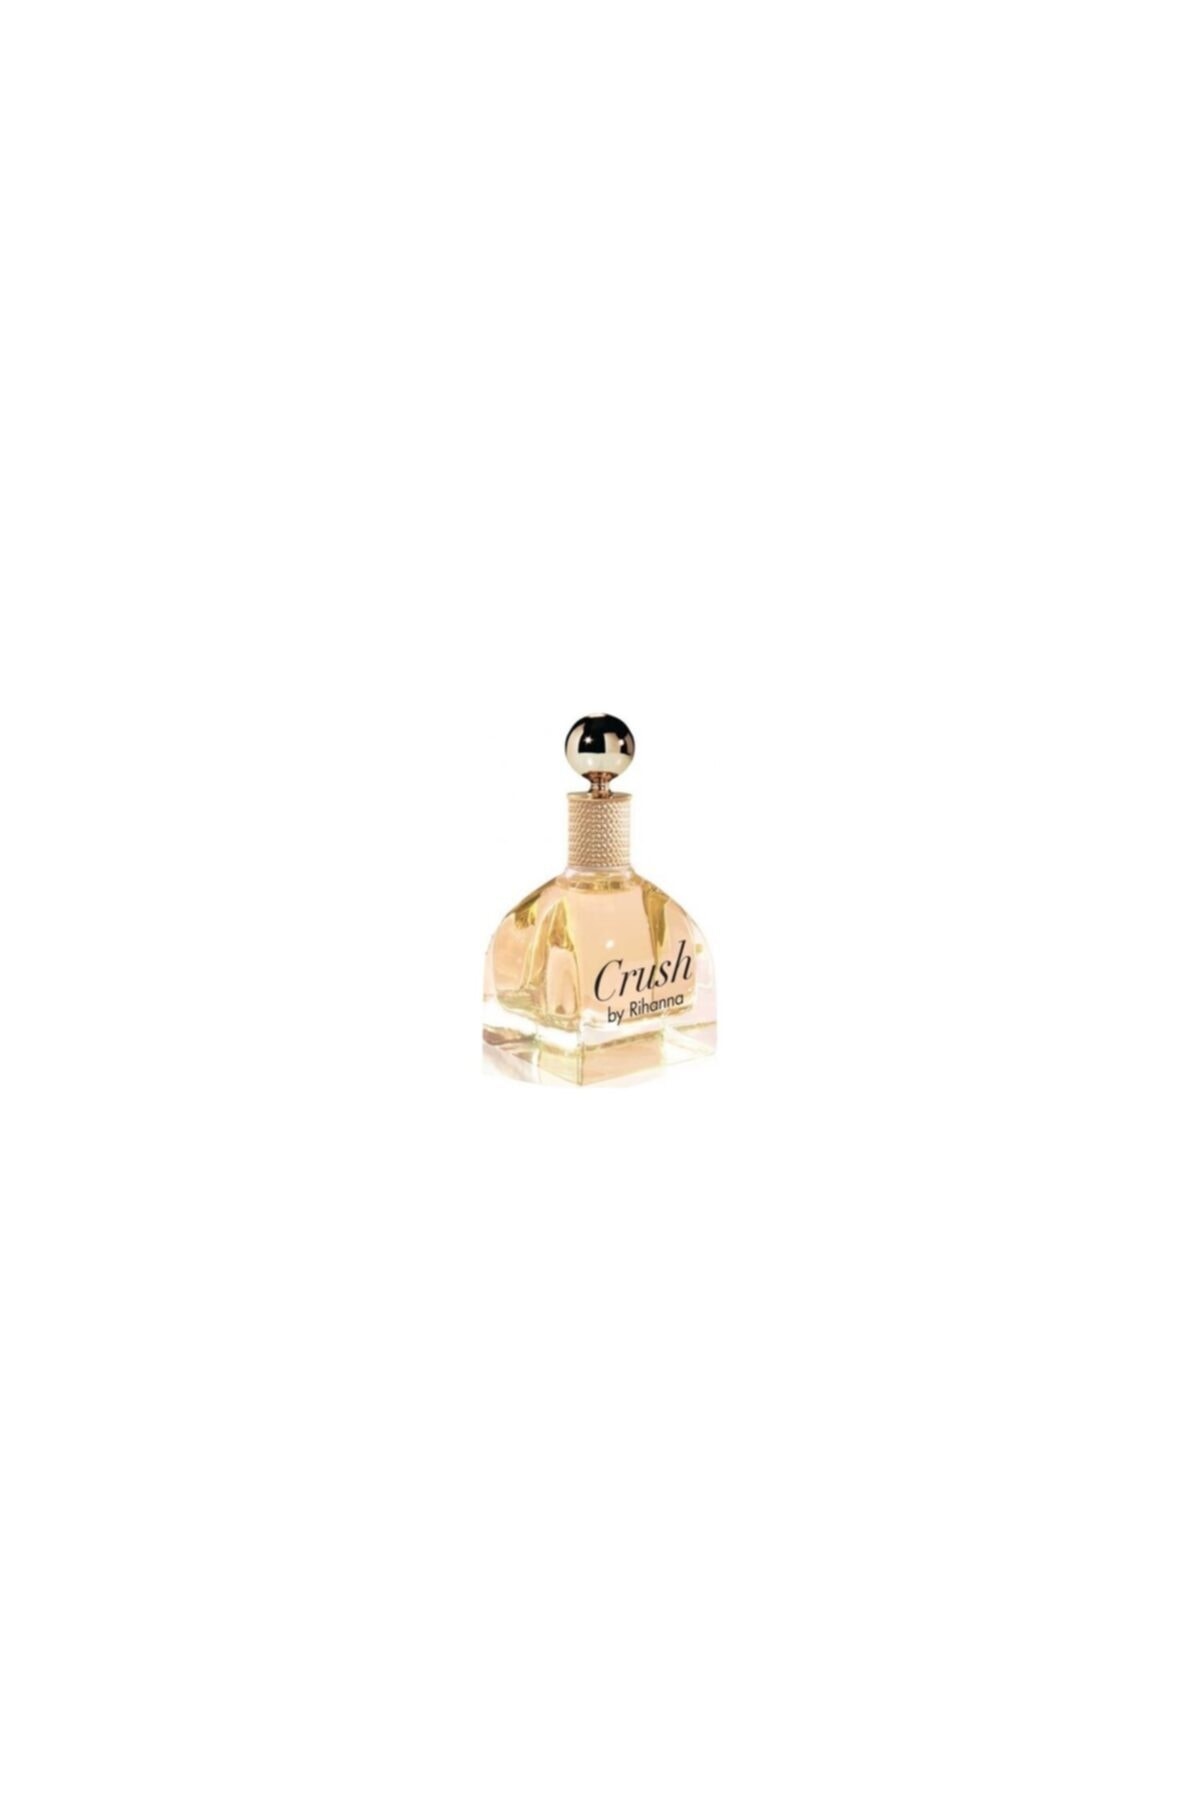 Rihanna Crush By Rihanna Edp 100 ml Kadın Parfümü 608940567913 2